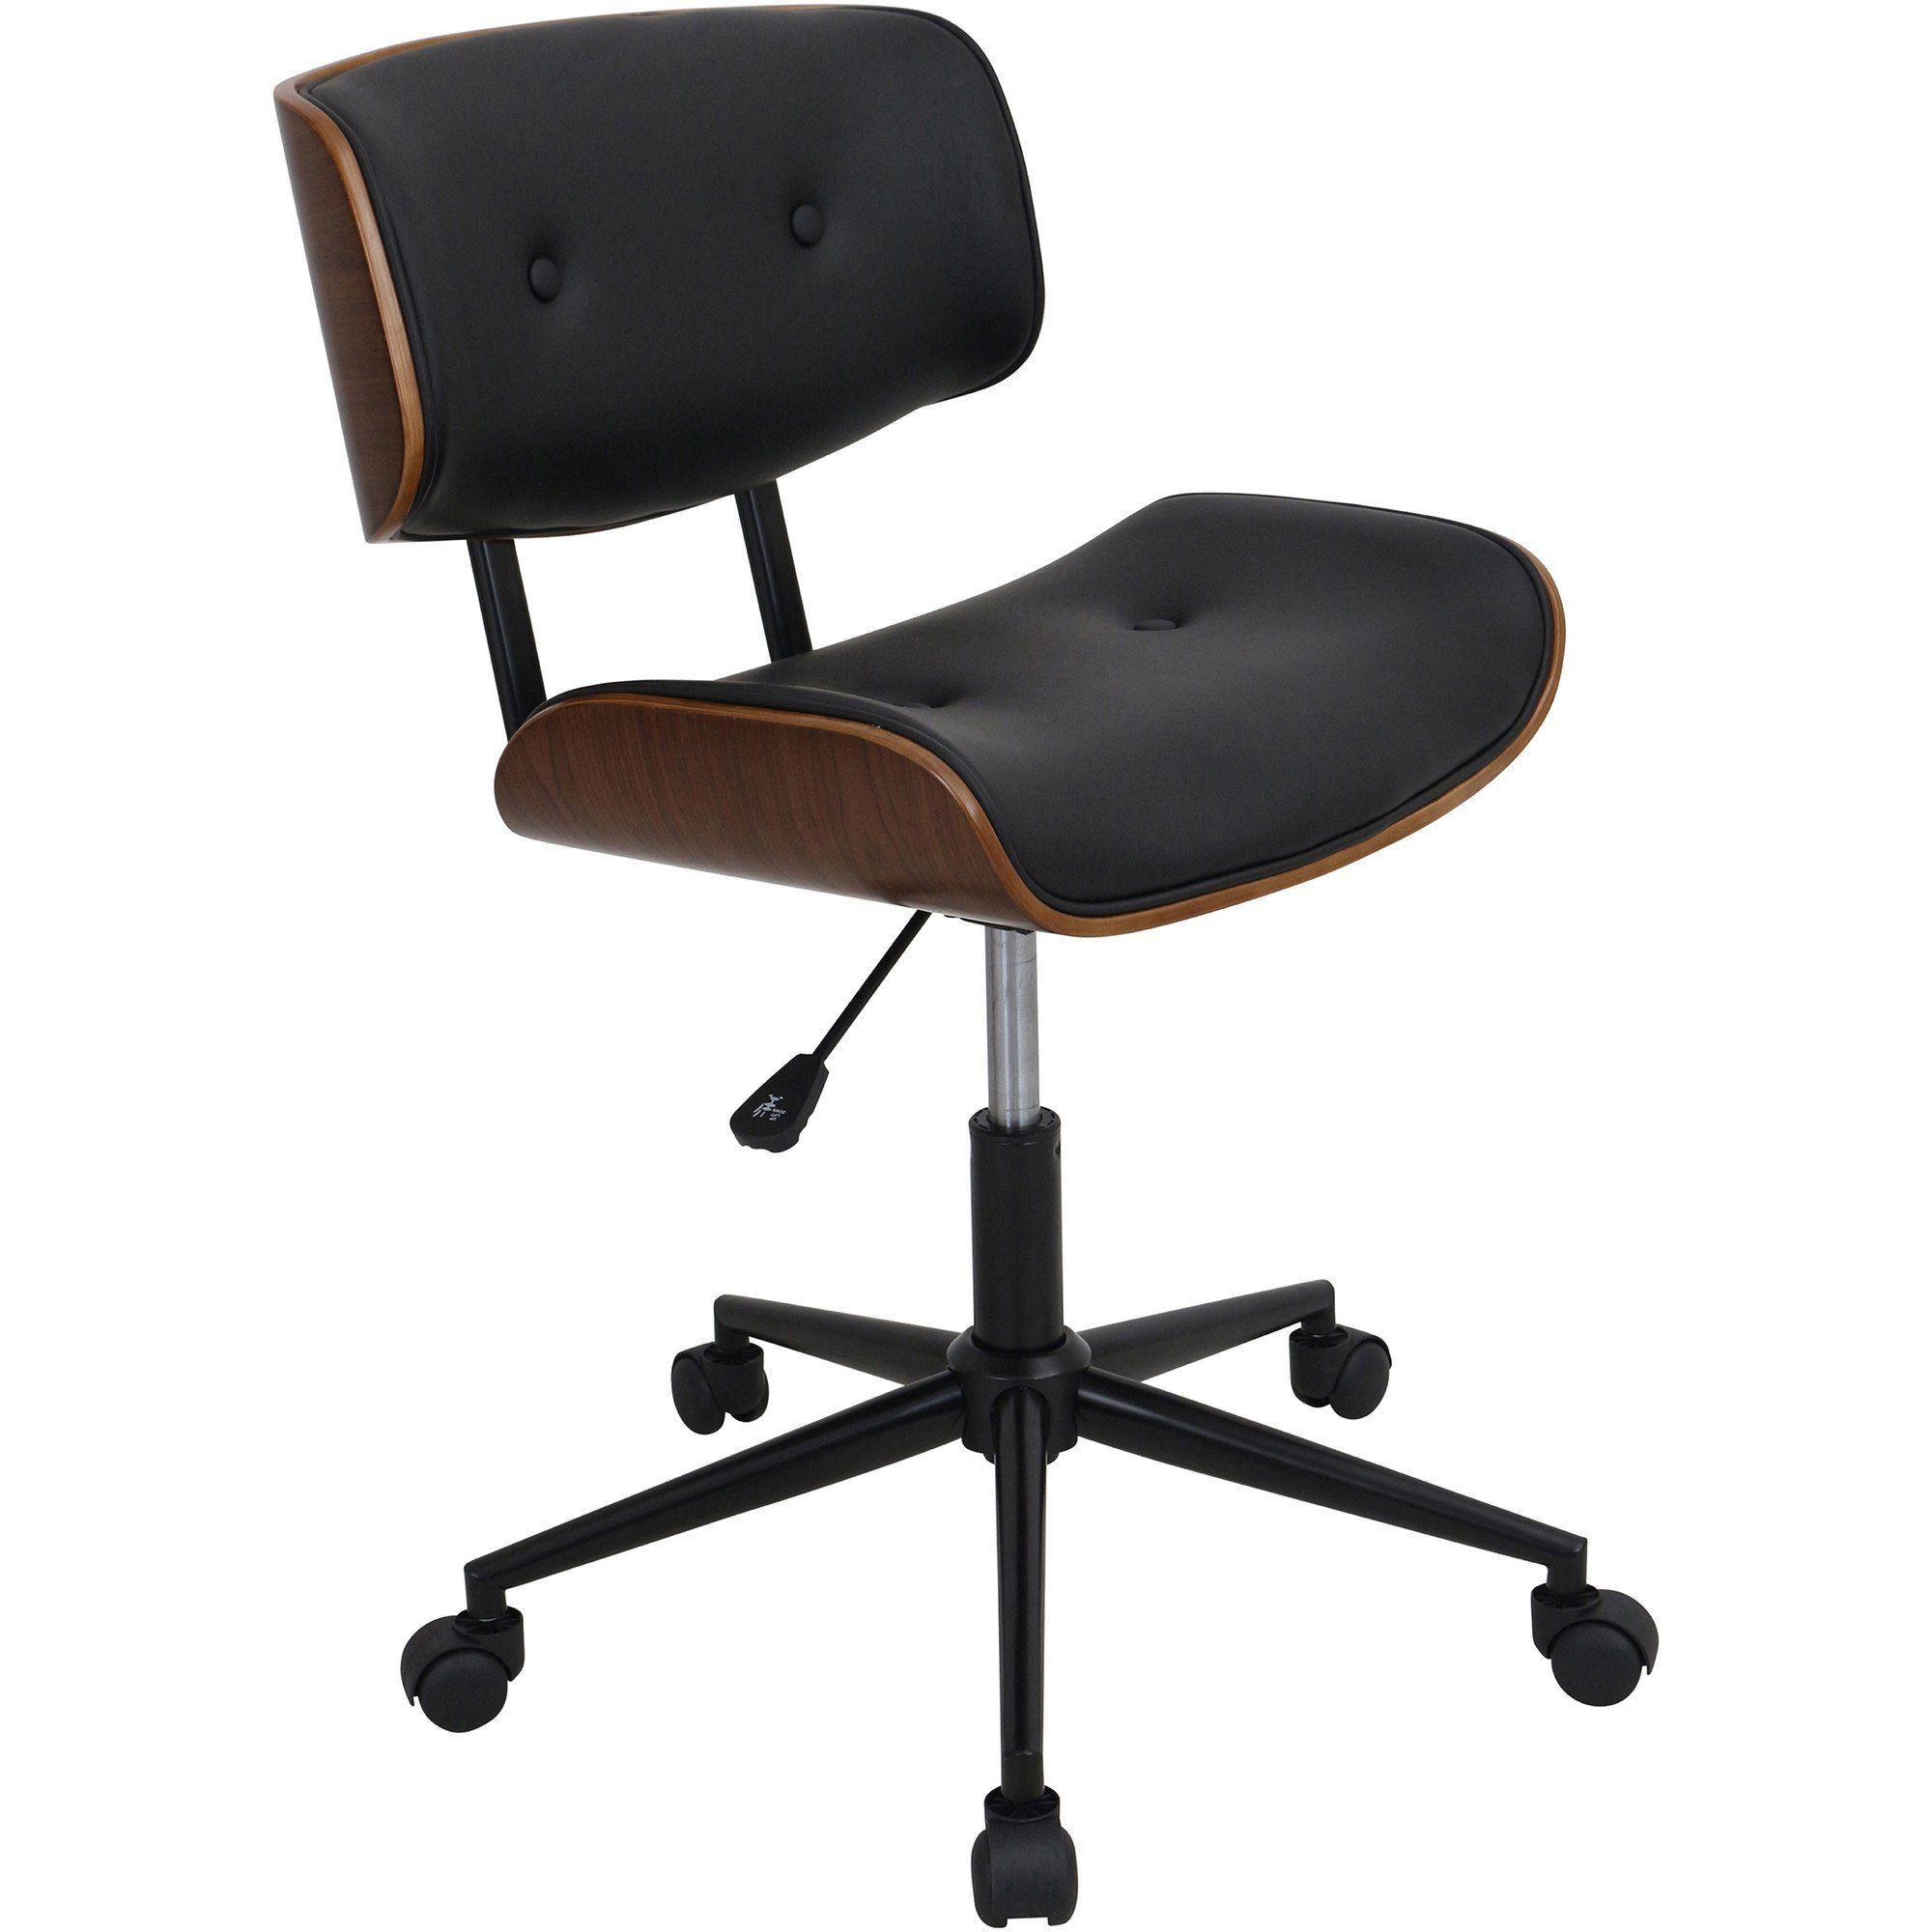 Lombardi Height Adjustable Swivel Office Chair Walnut Black Swivel Office Chair Black Office Chair Adjustable Office Chair